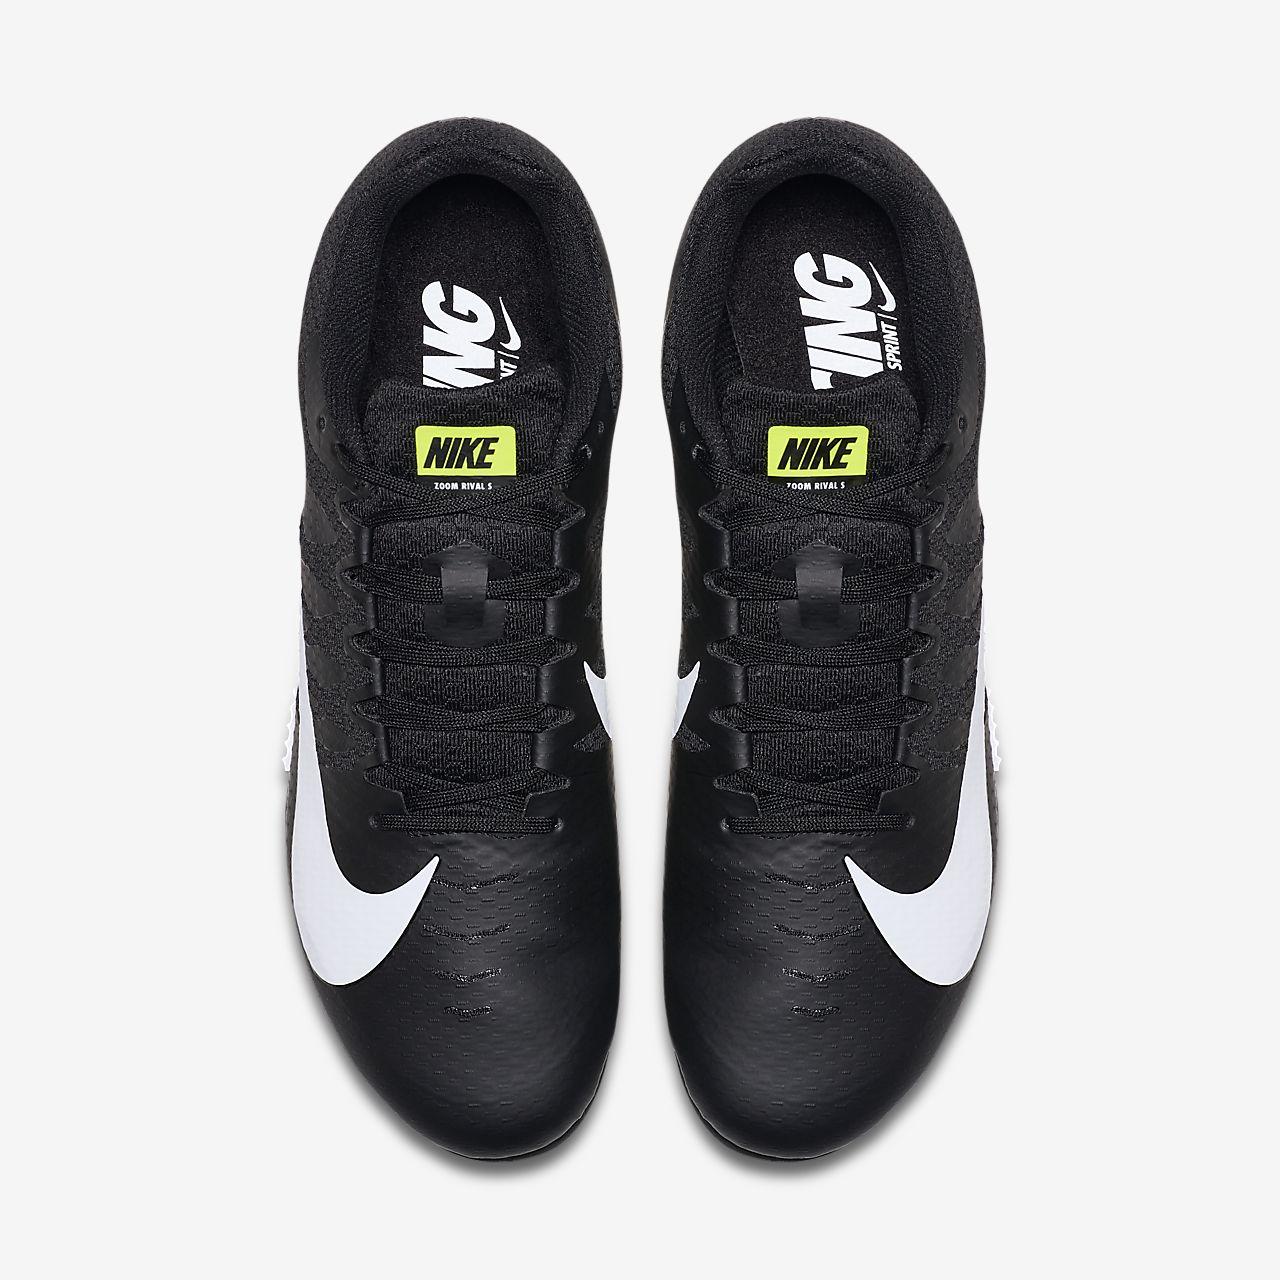 misure scarpe chiodate nike